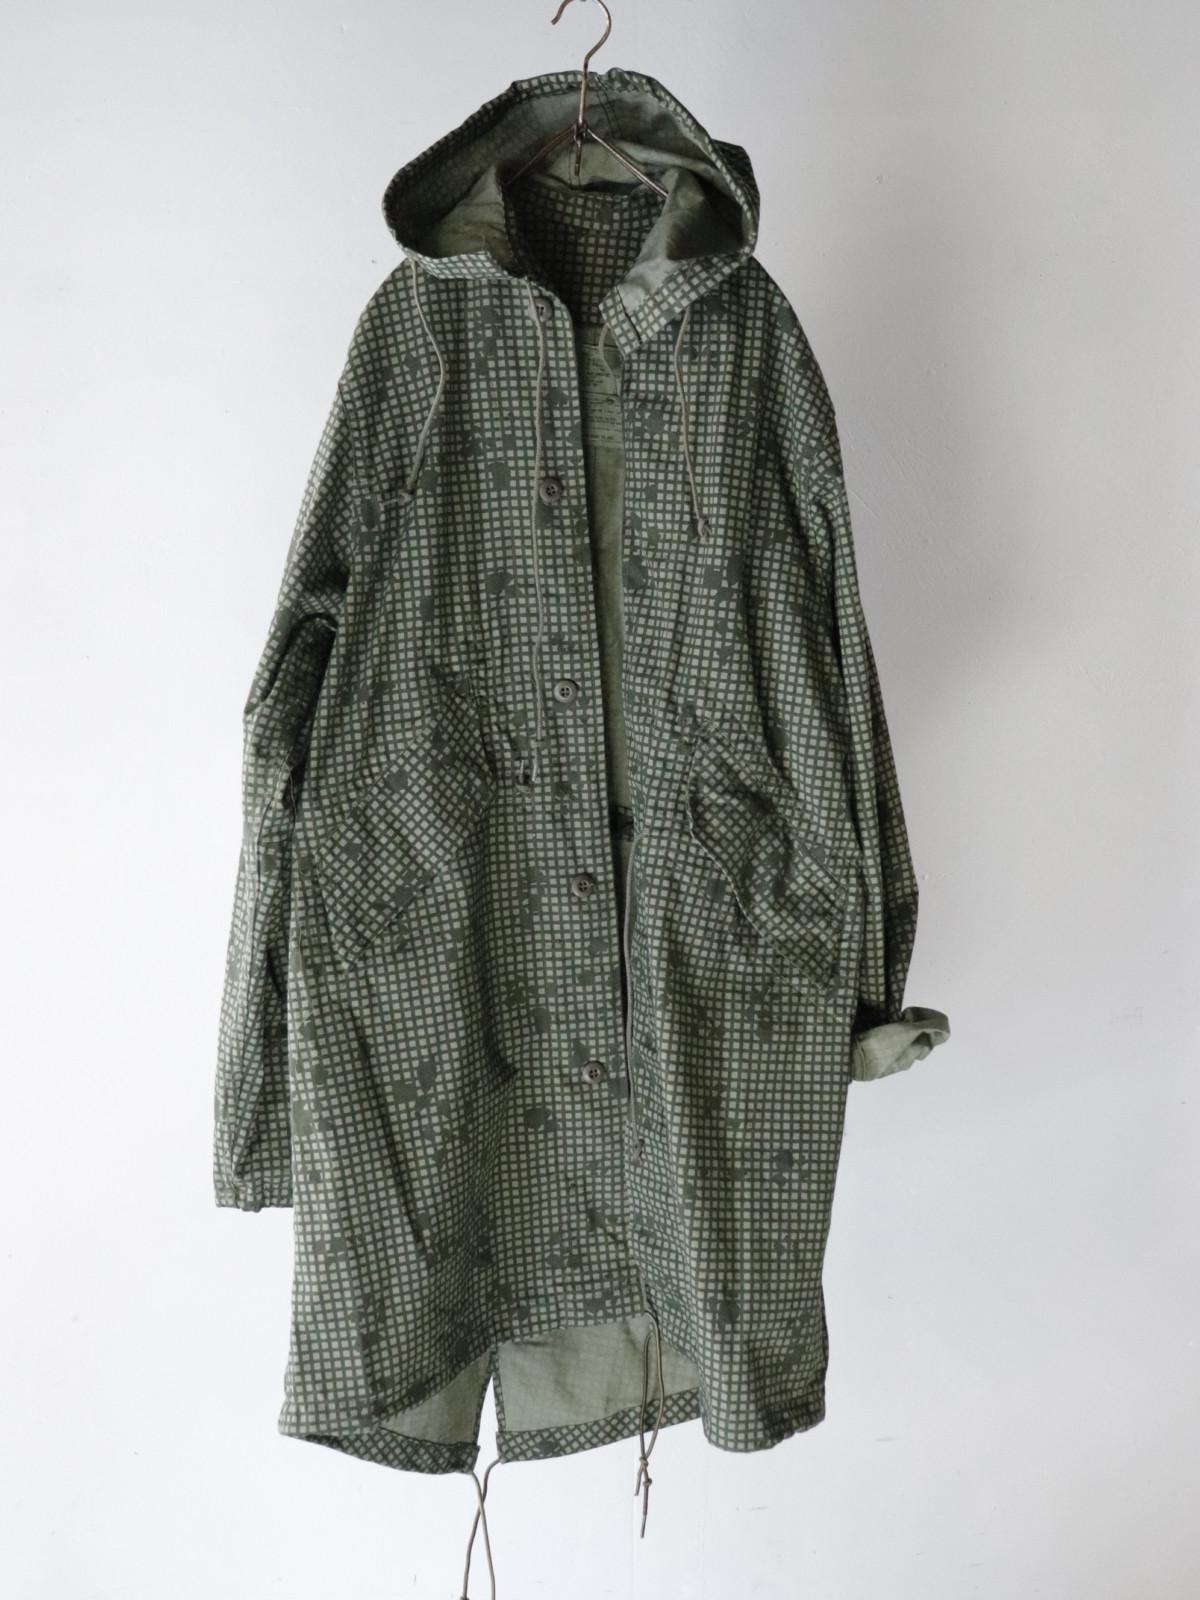 USA,military,night camo,coat,vintage